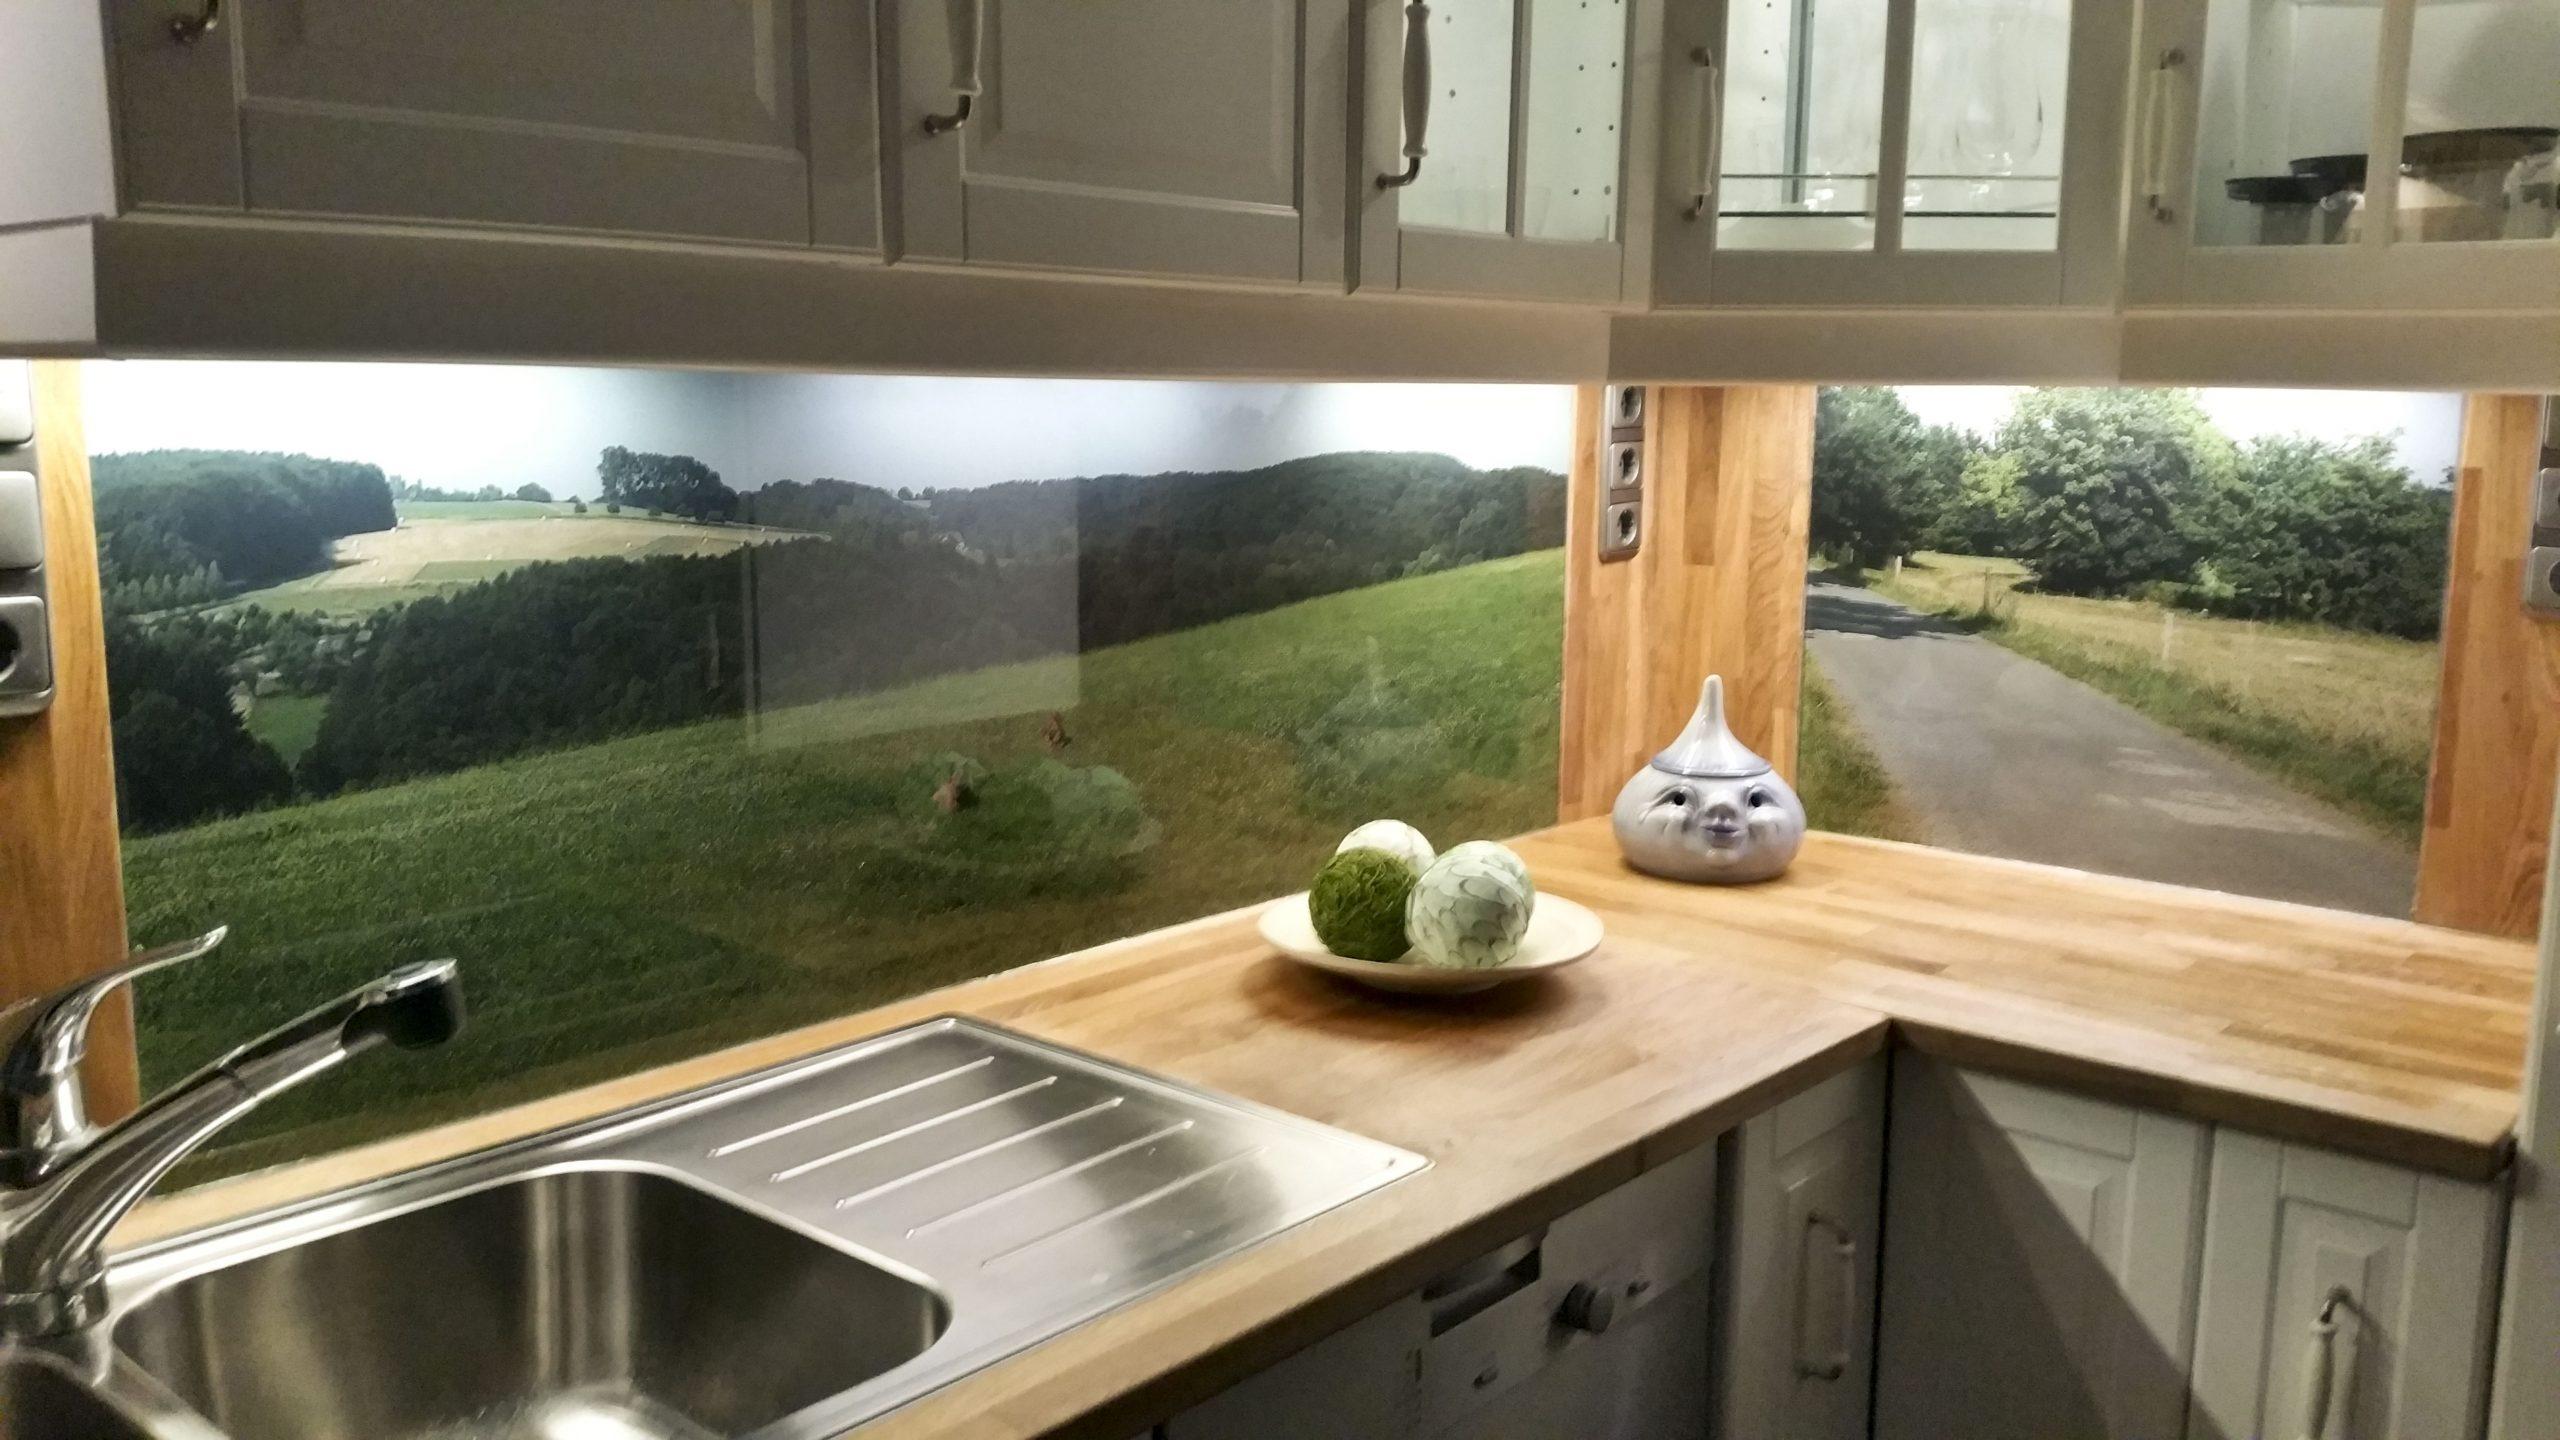 Full Size of Glaswand Küche Montage Glaswand Küche Reinigen Hinterleuchtete Glaswand Küche Glaswand Küche Kosten Küche Glaswand Küche